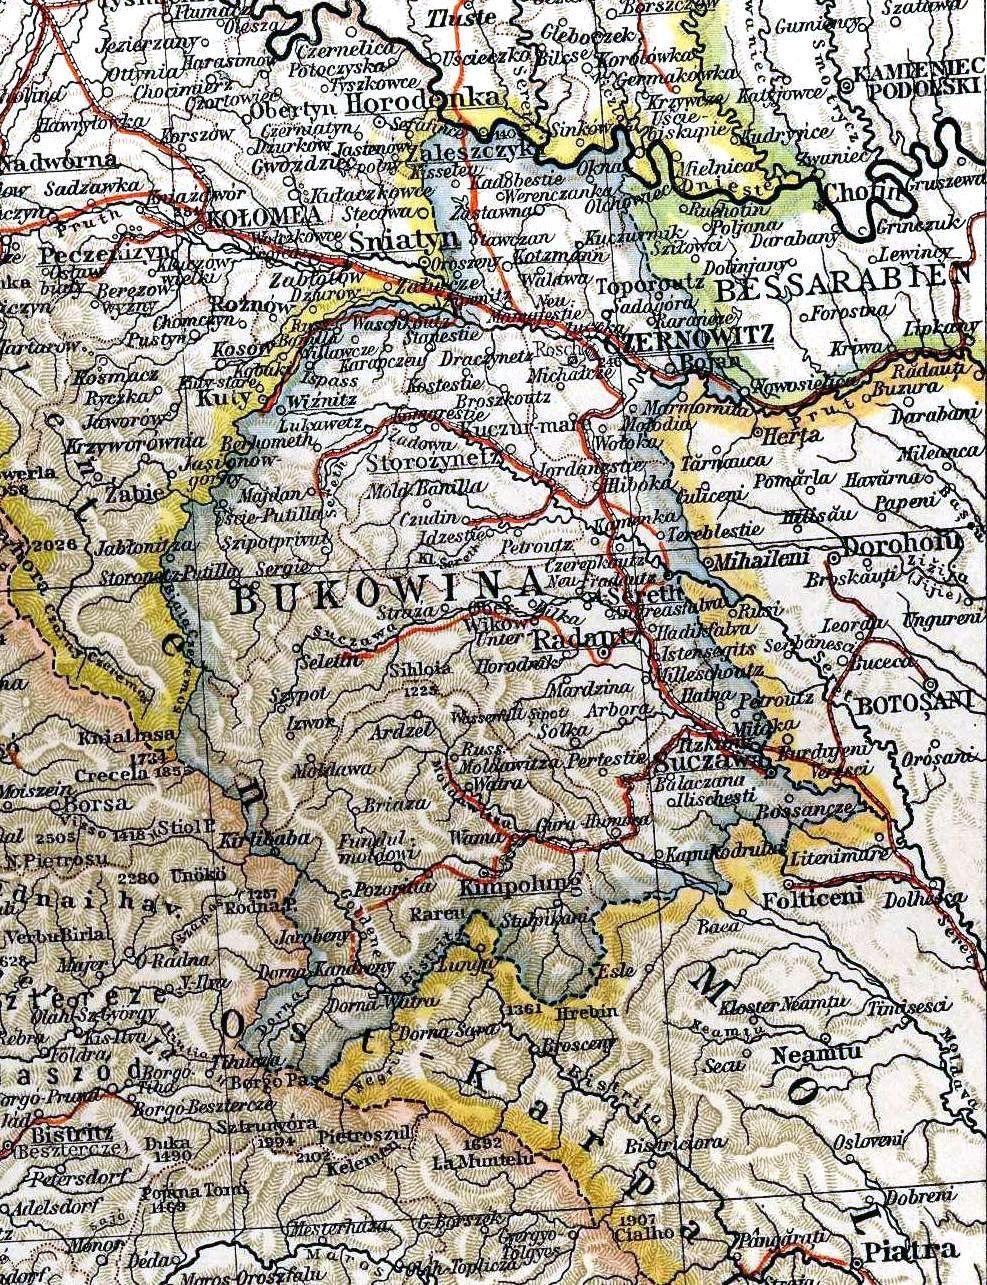 Una breve storia dell'Ucraina: videointervista a Oles